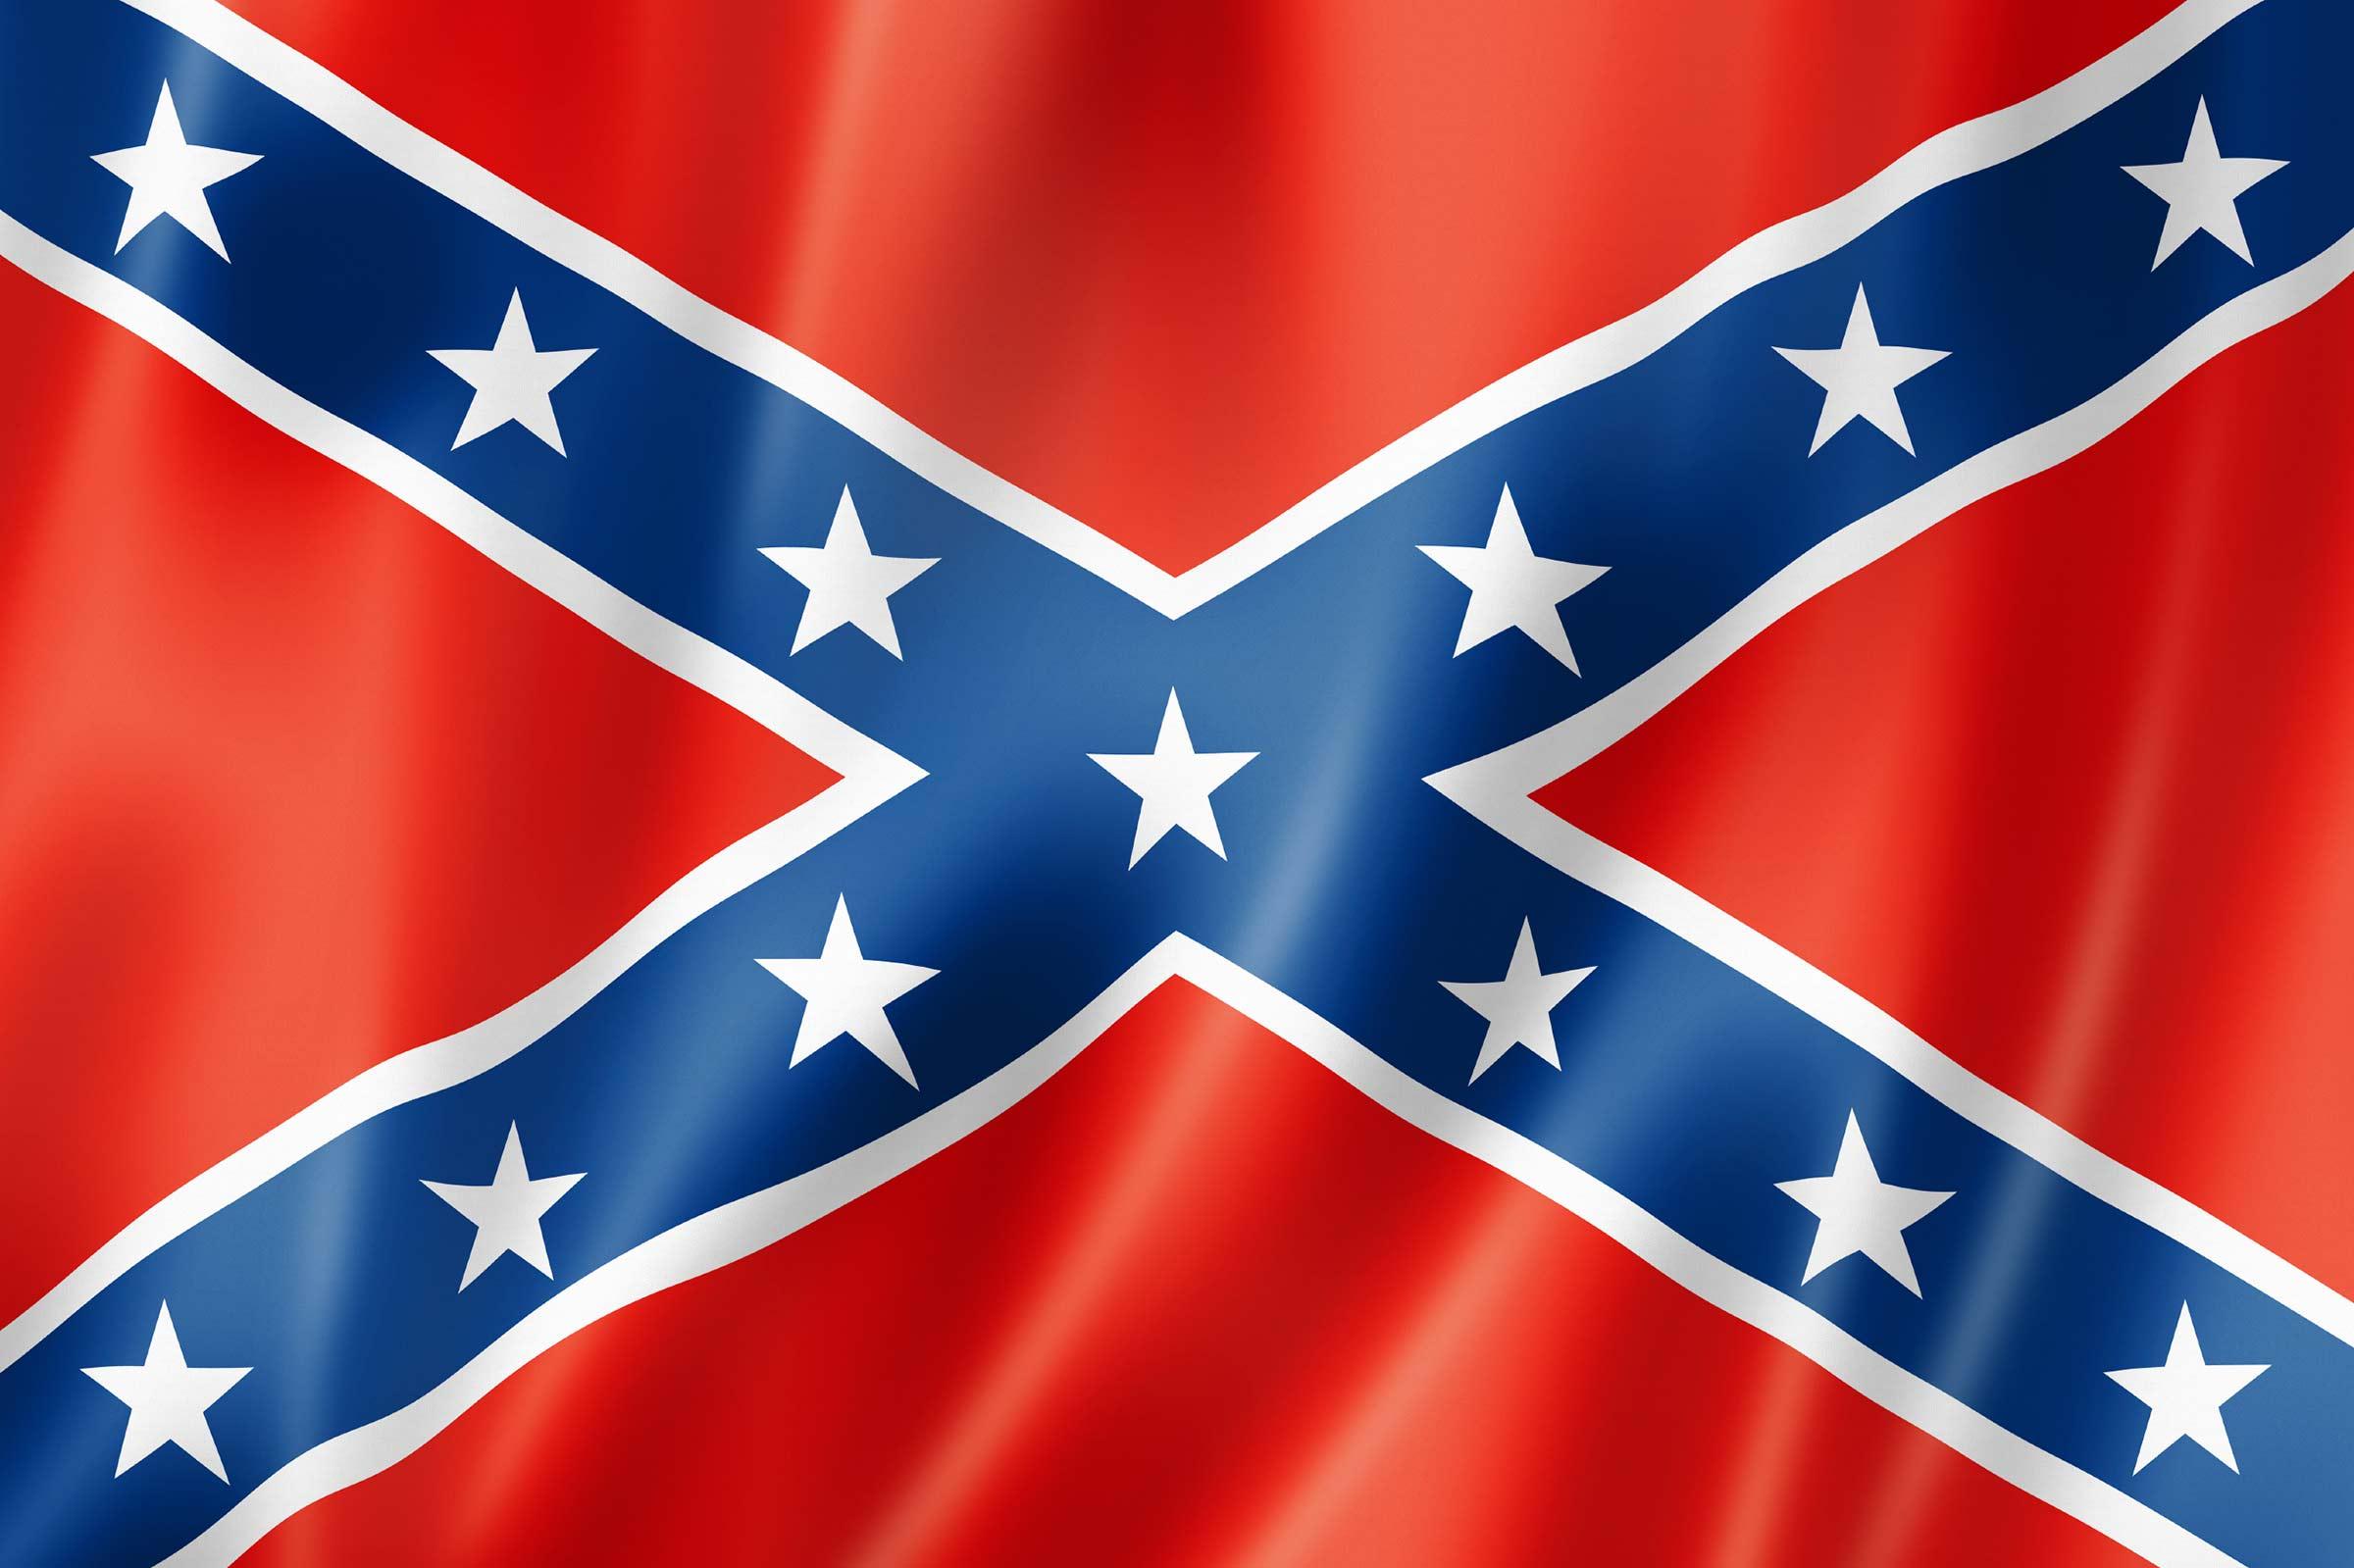 Mississippi, Alabama marking Confederate Memorial Day